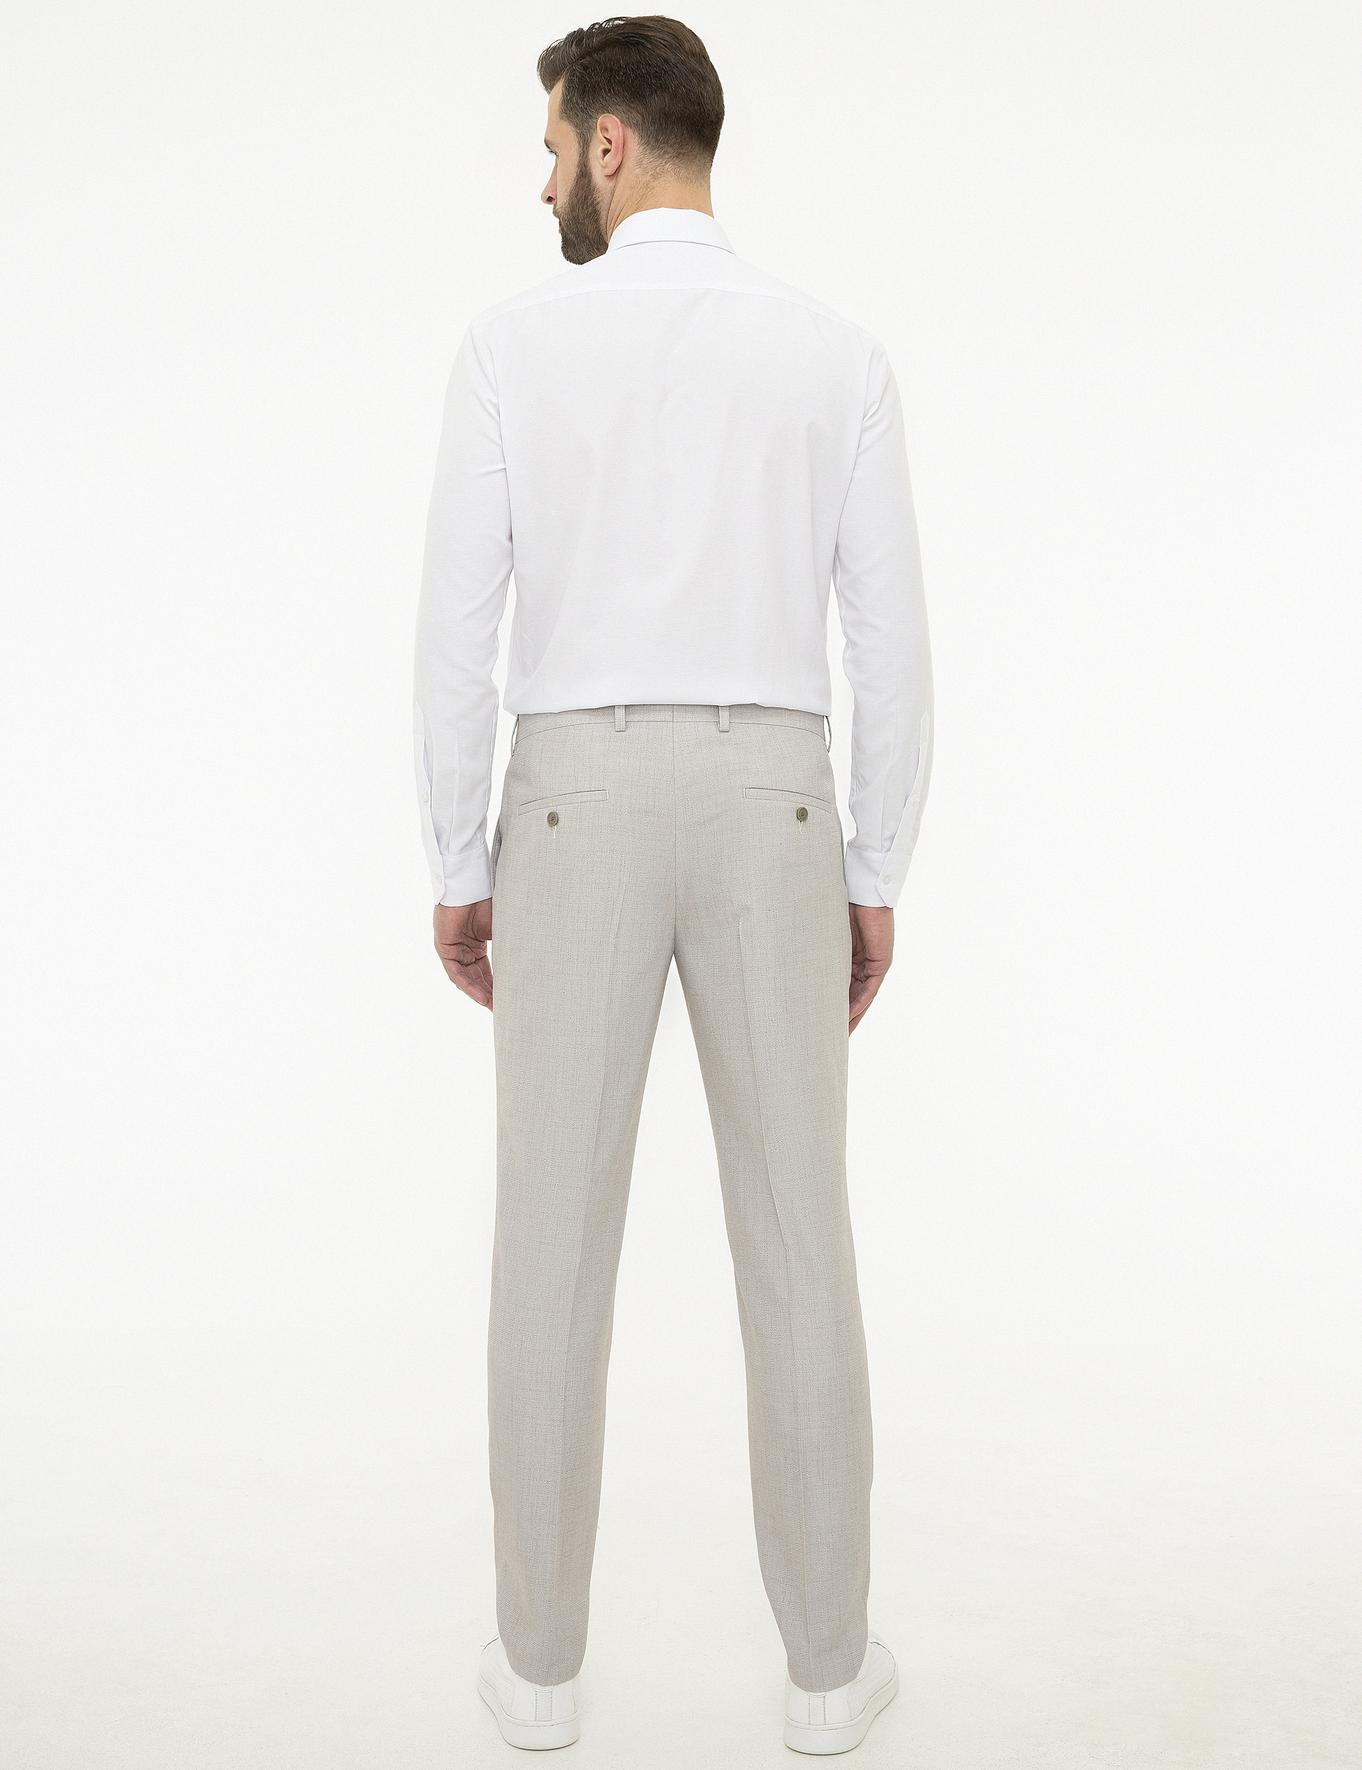 Gri Ekstra Slim Fit Pantolon